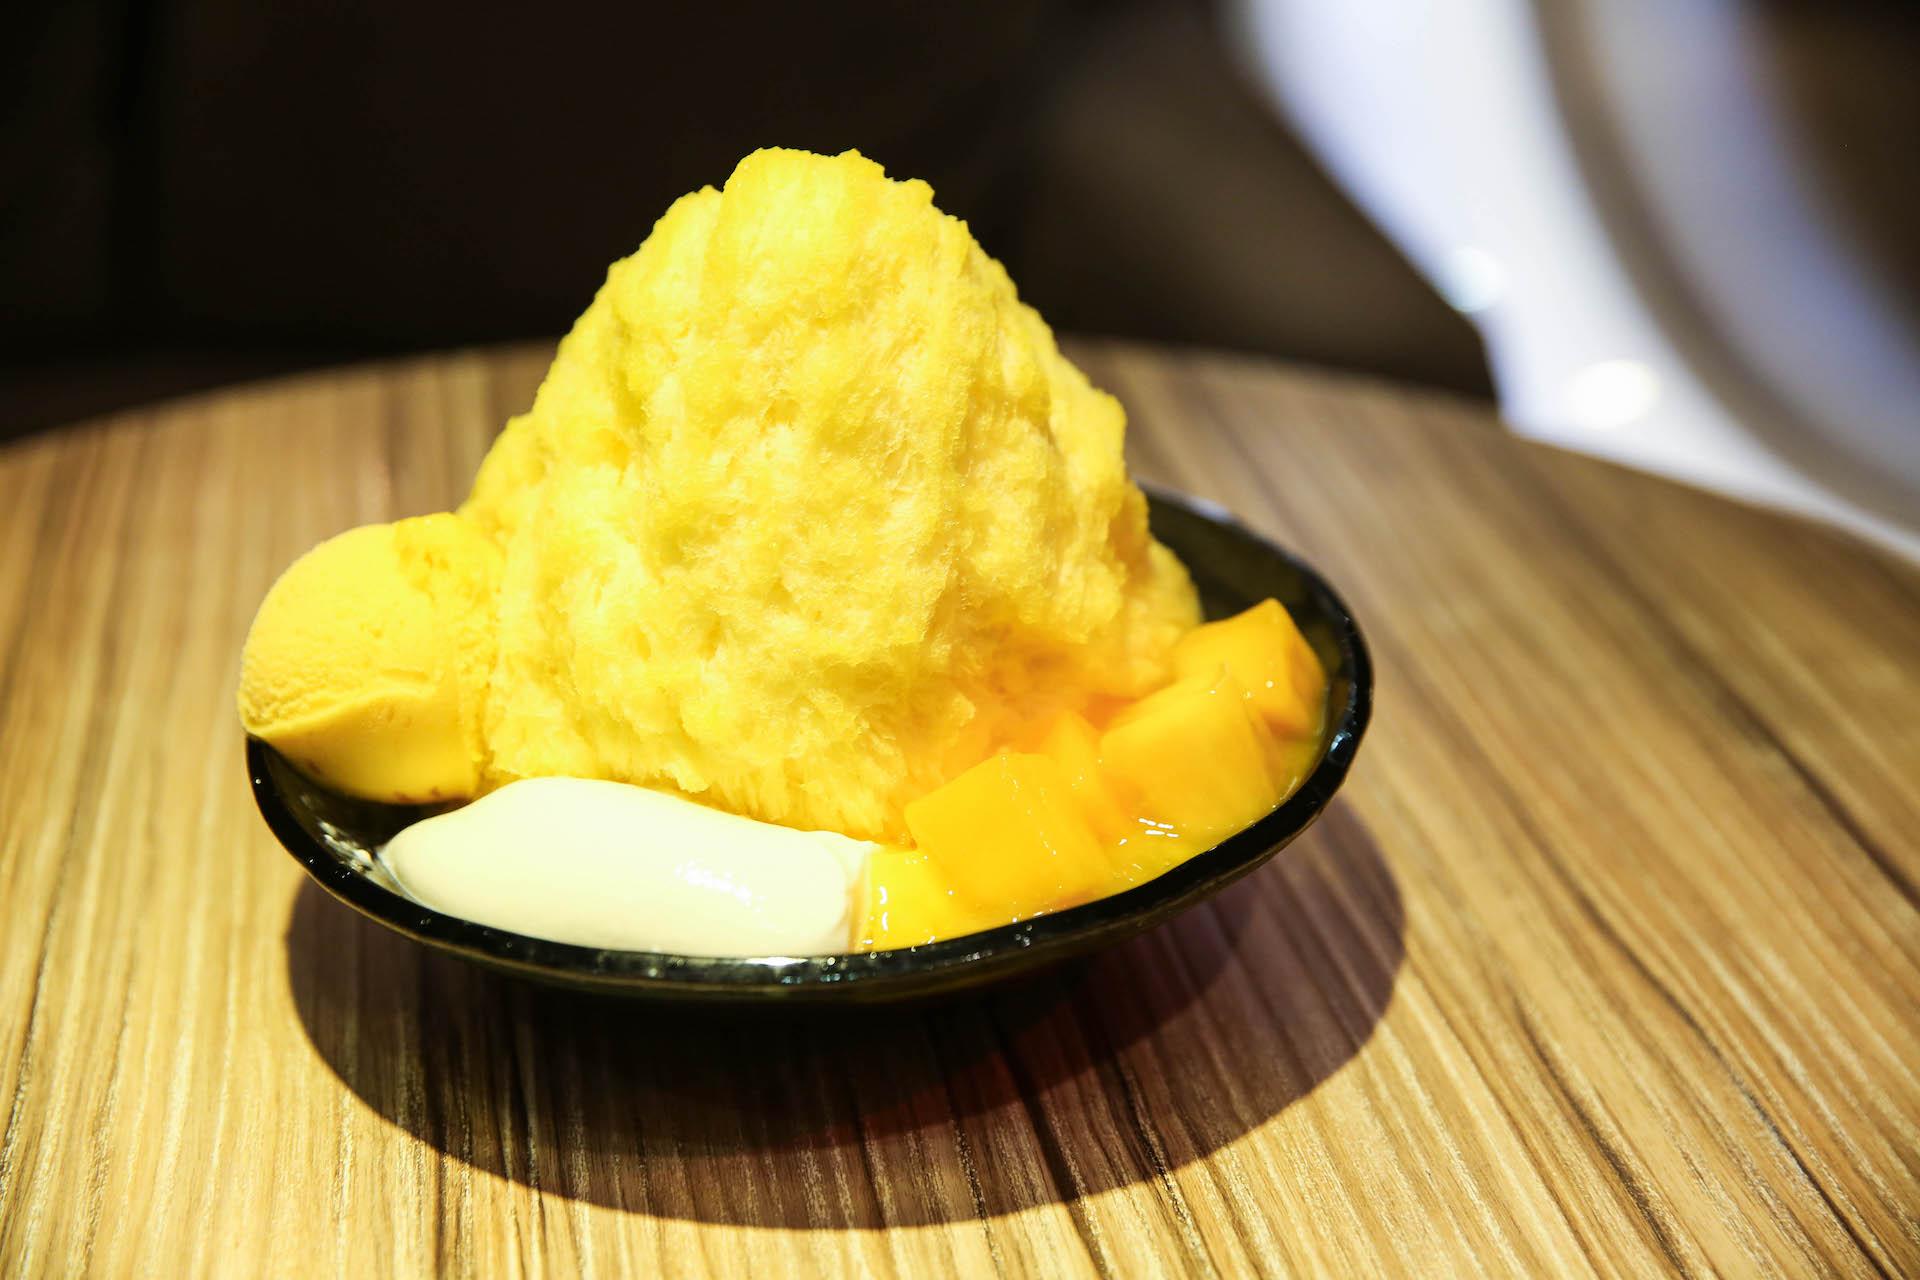 The famed Mango Sweet Cotton Ice, served with fresh mangoes, pudding, and mango ice cream.